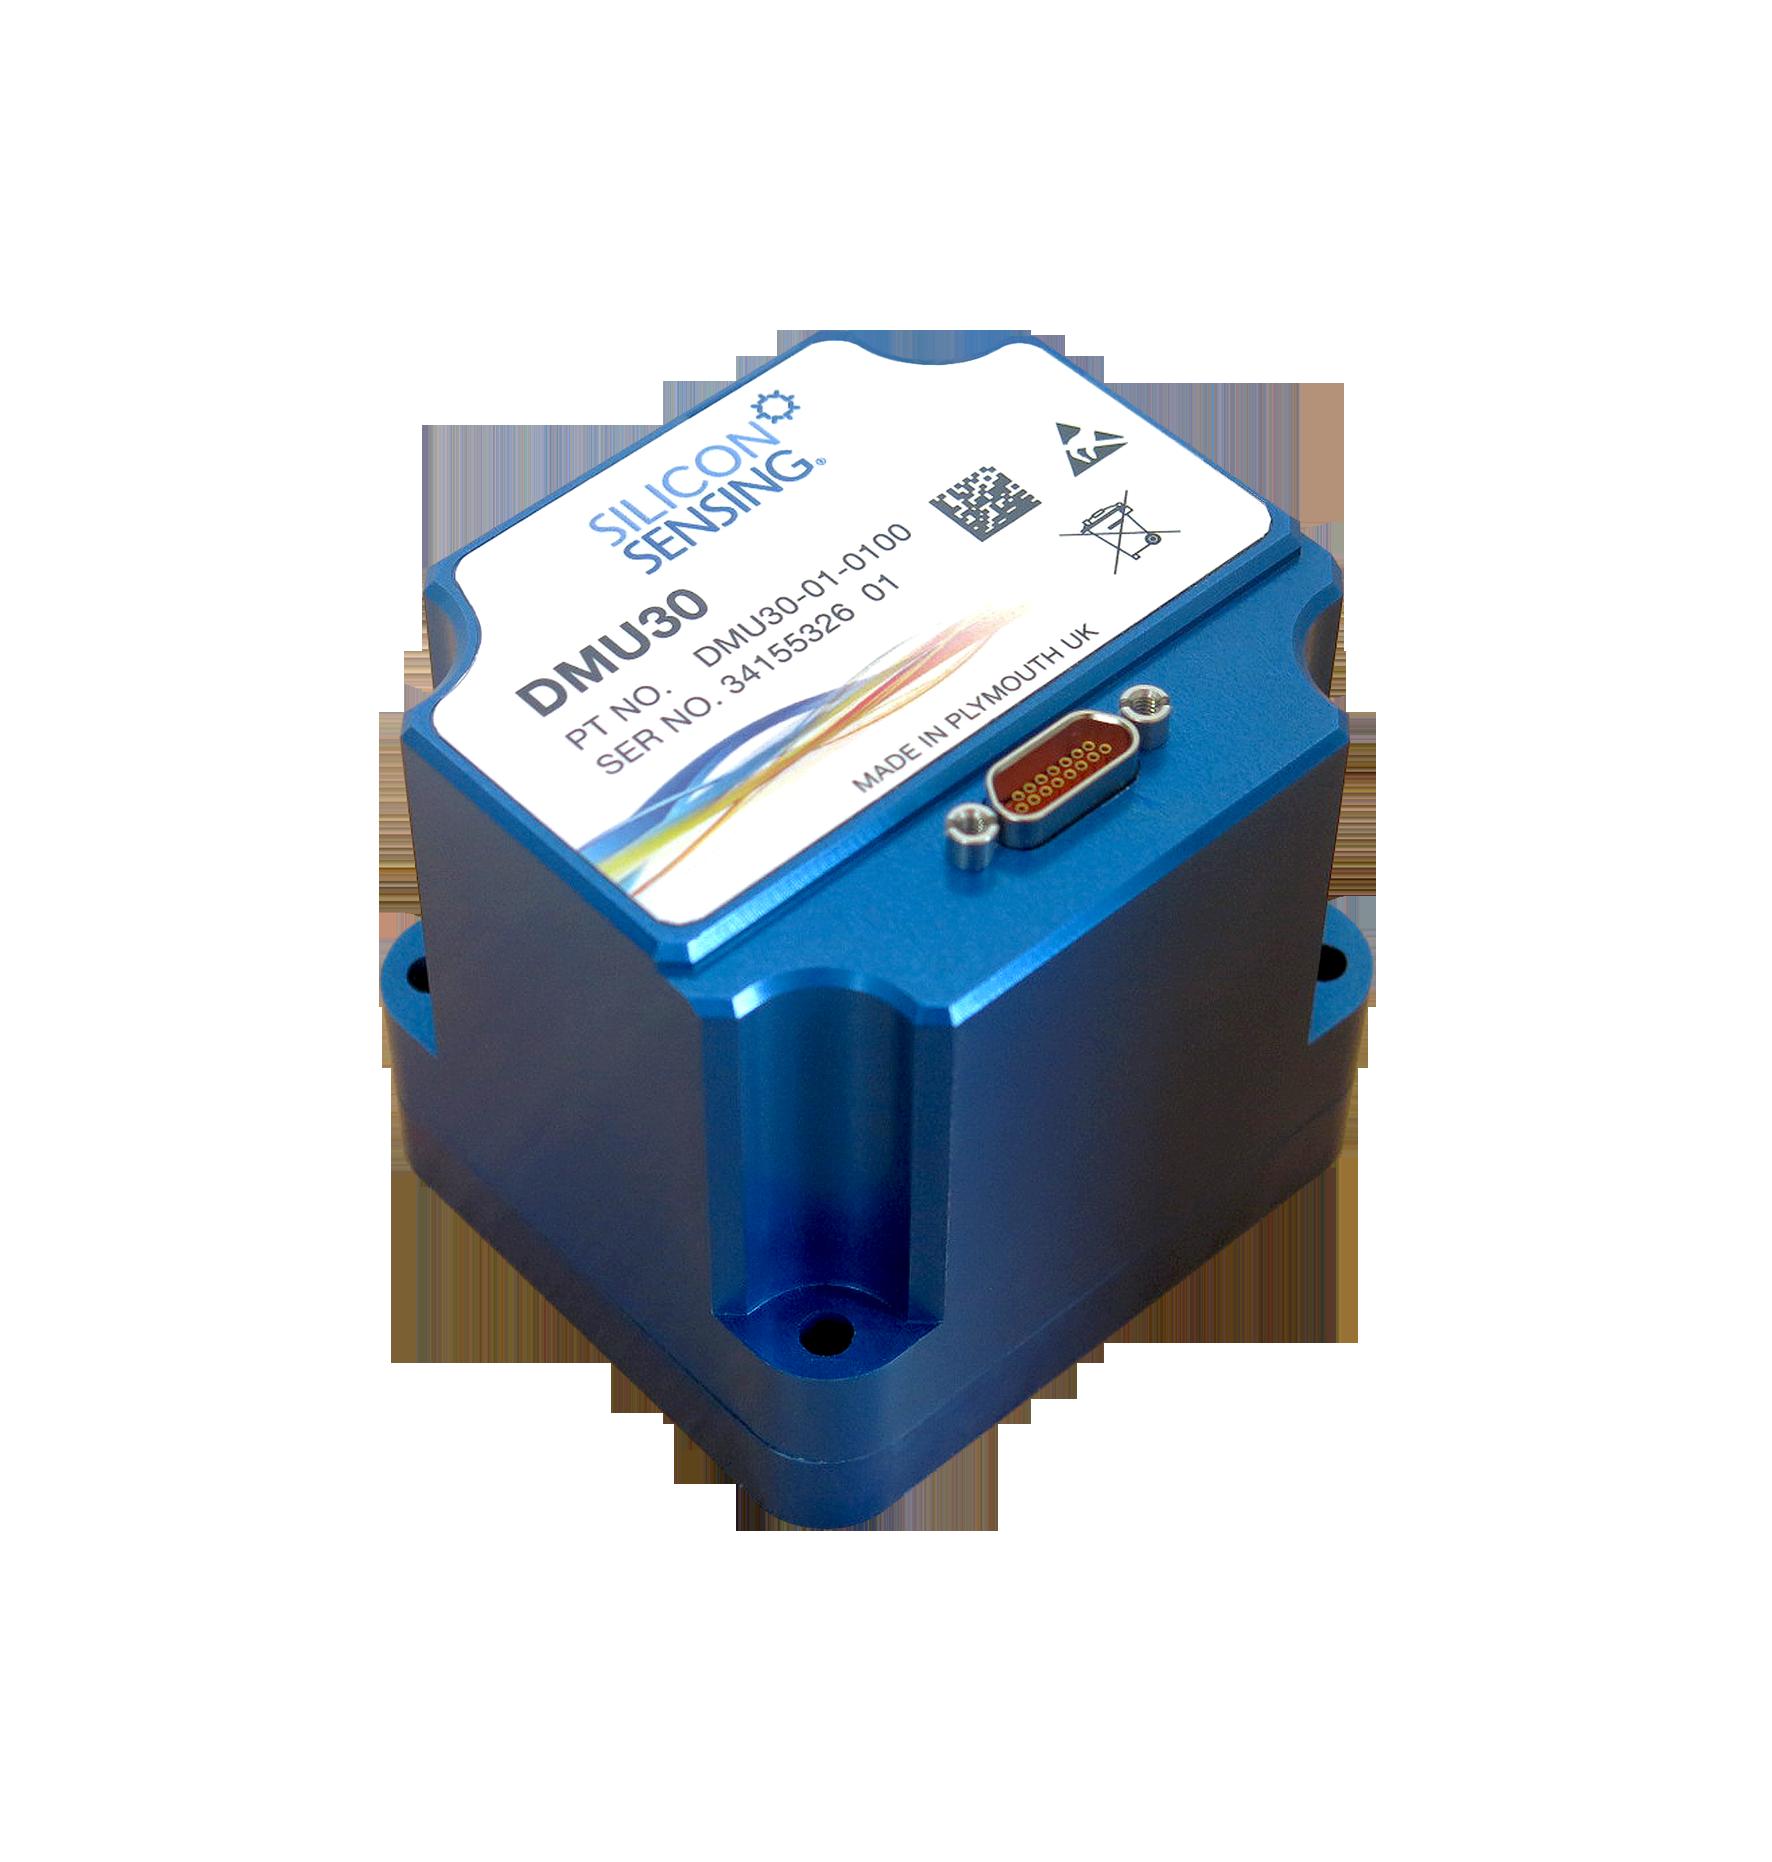 Silicon Sensing | DMU30 High Performance MEMS IMU